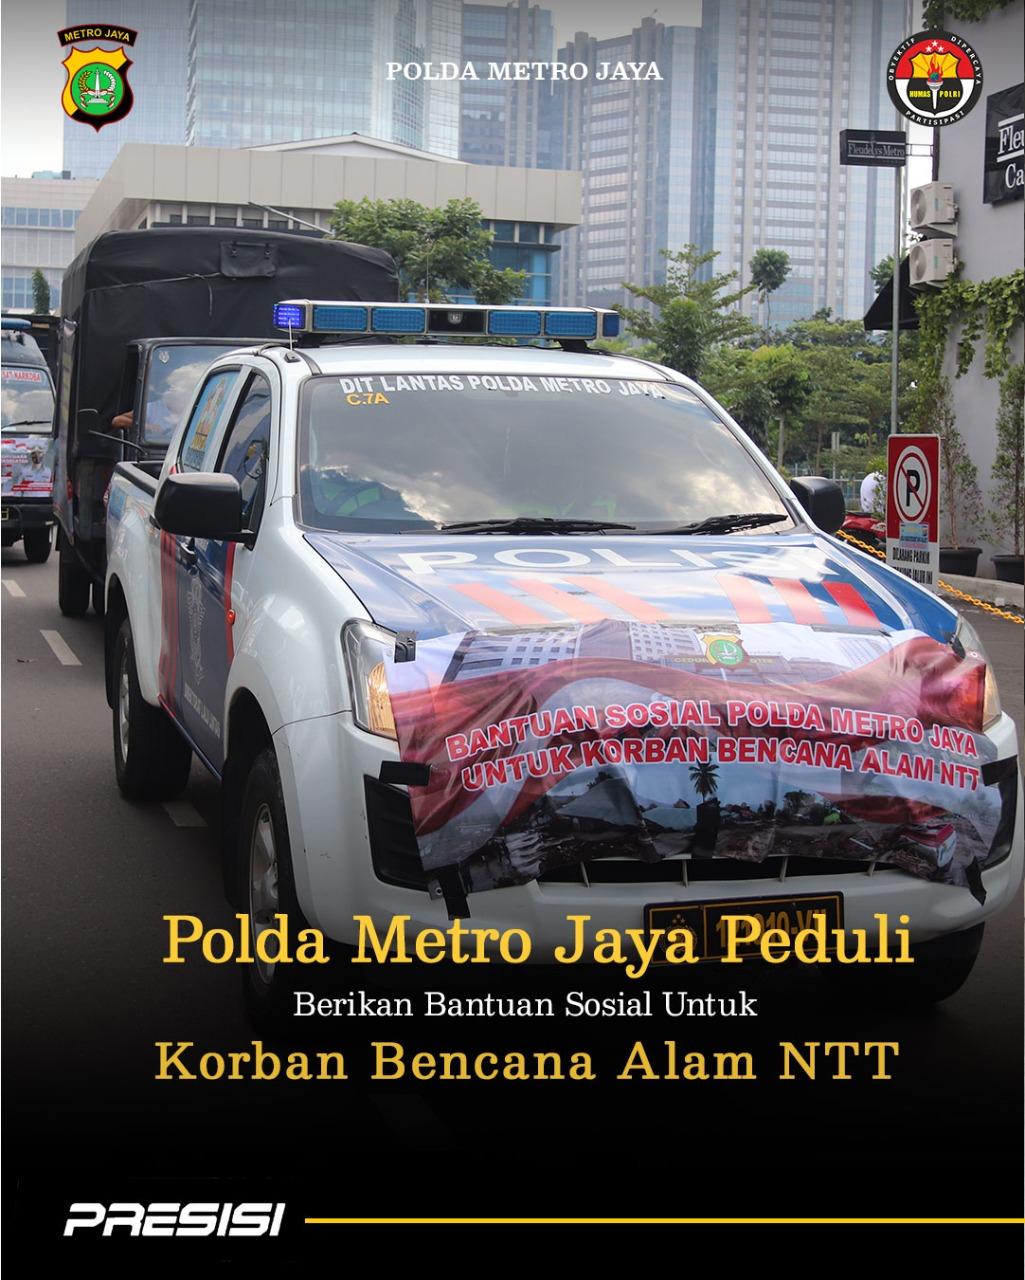 Polda Metro Jaya Peduli, Kirim Bantuan Sosial Untuk Korban Bencana Alam NTT